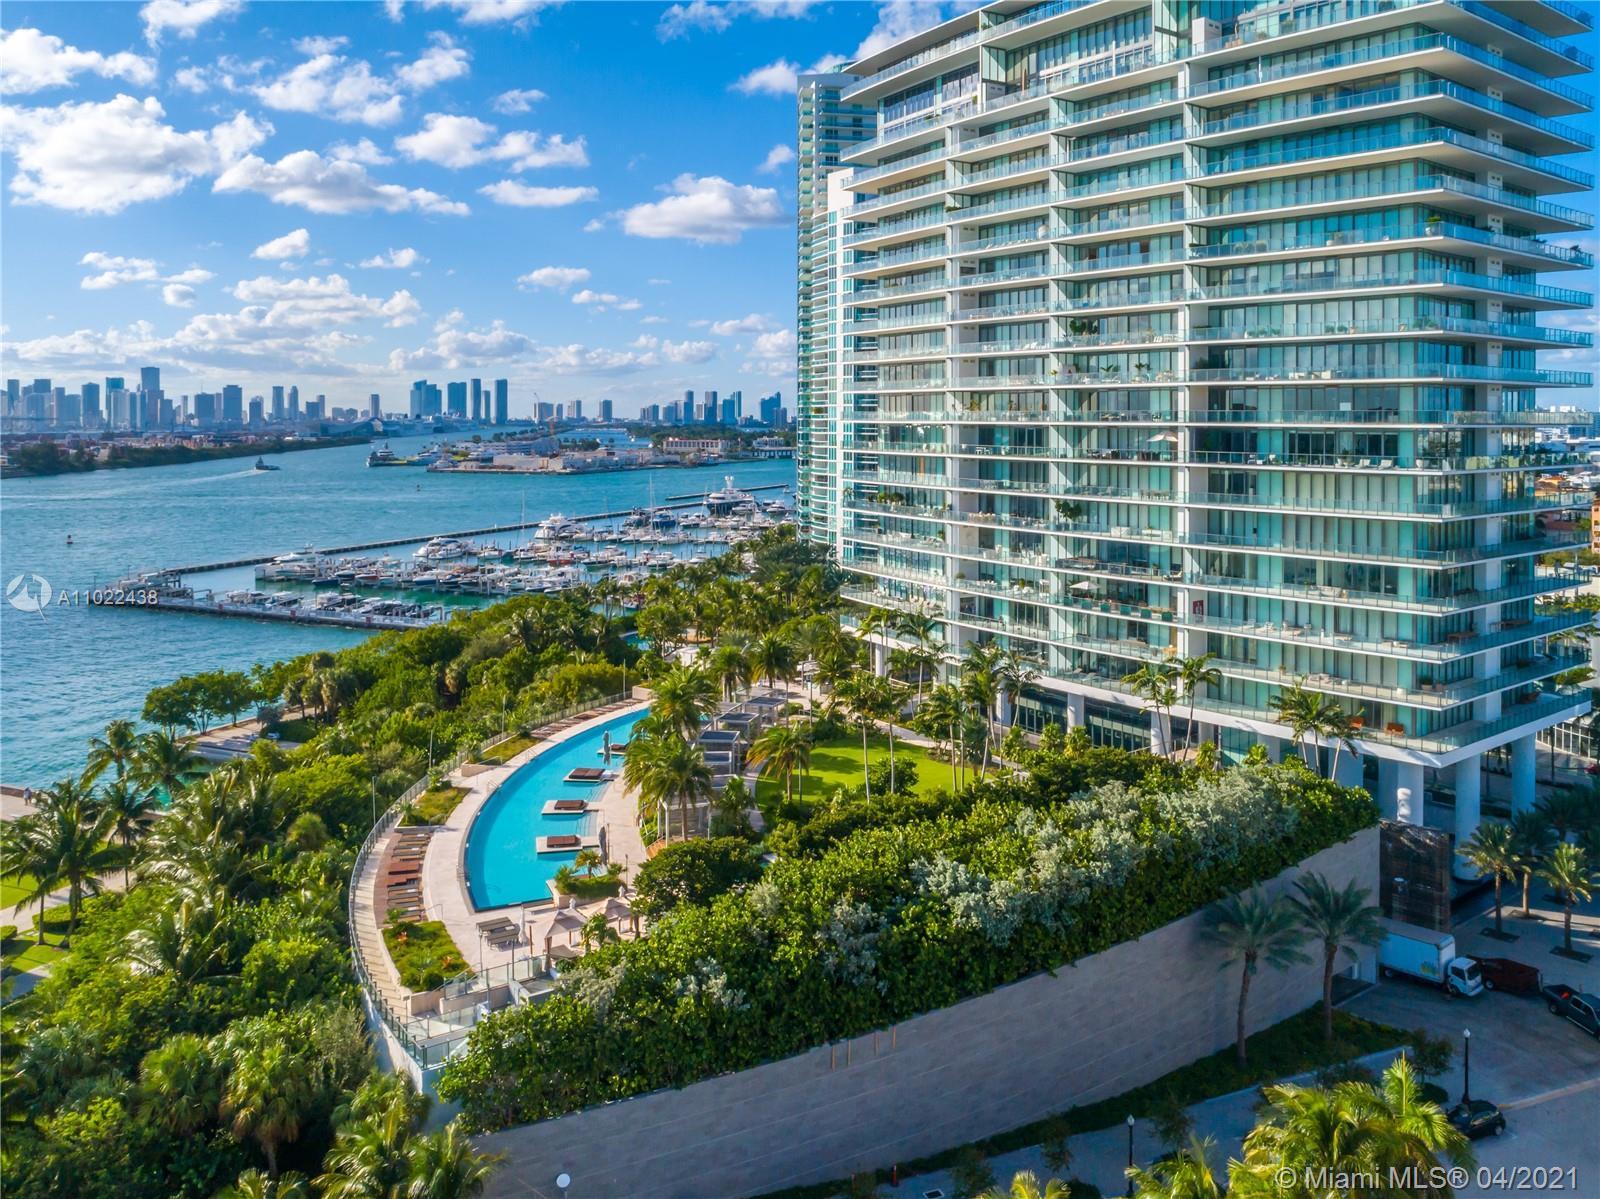 Apogee #502 - 800 S Pointe Dr #502, Miami Beach, FL 33139